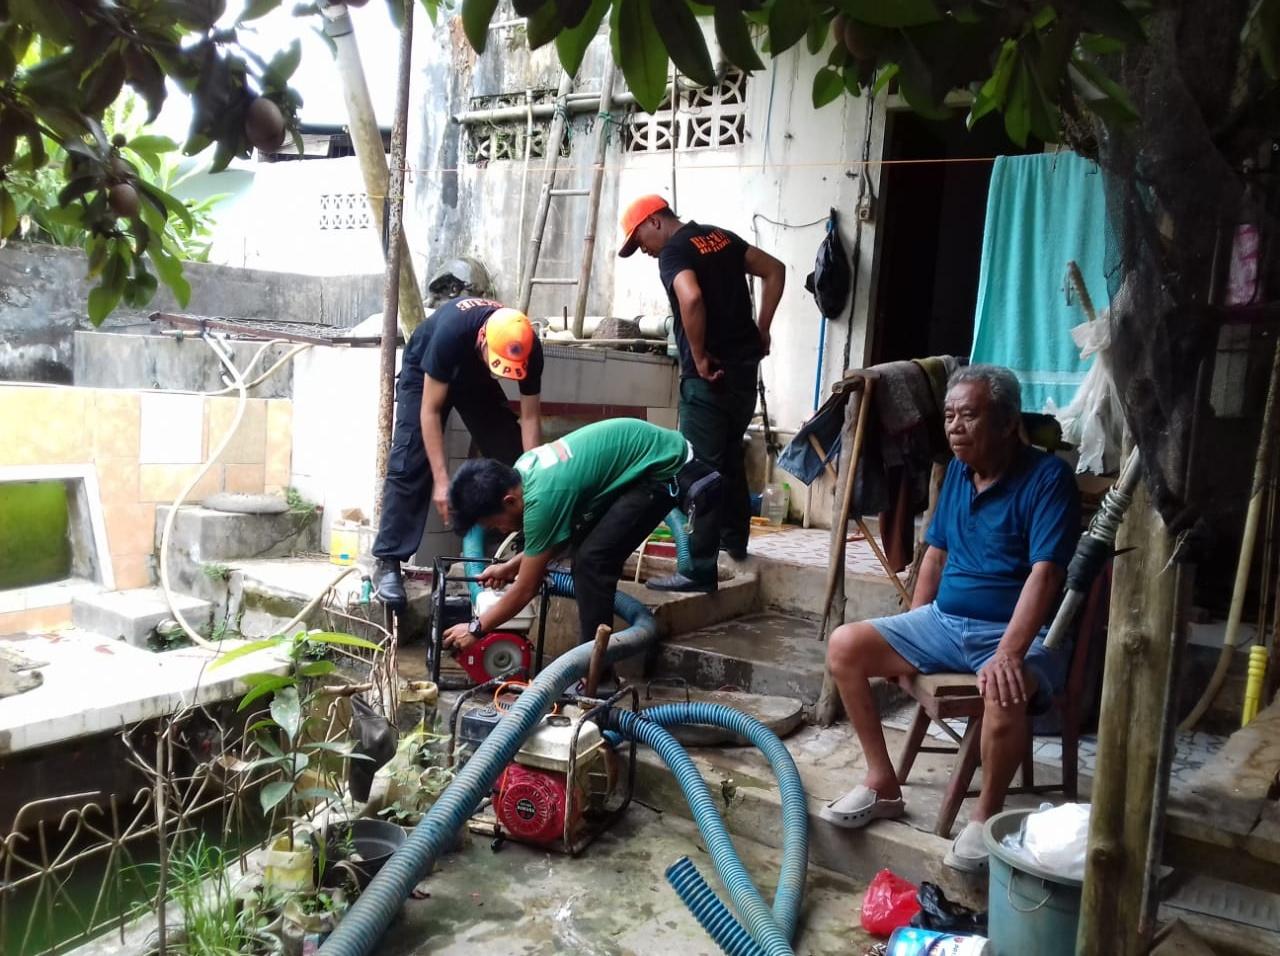 Pasca Banjir Air Keruh dan Bau, WMI Kuras Sumur Warga Sawah Lebar Kota Bengkulu